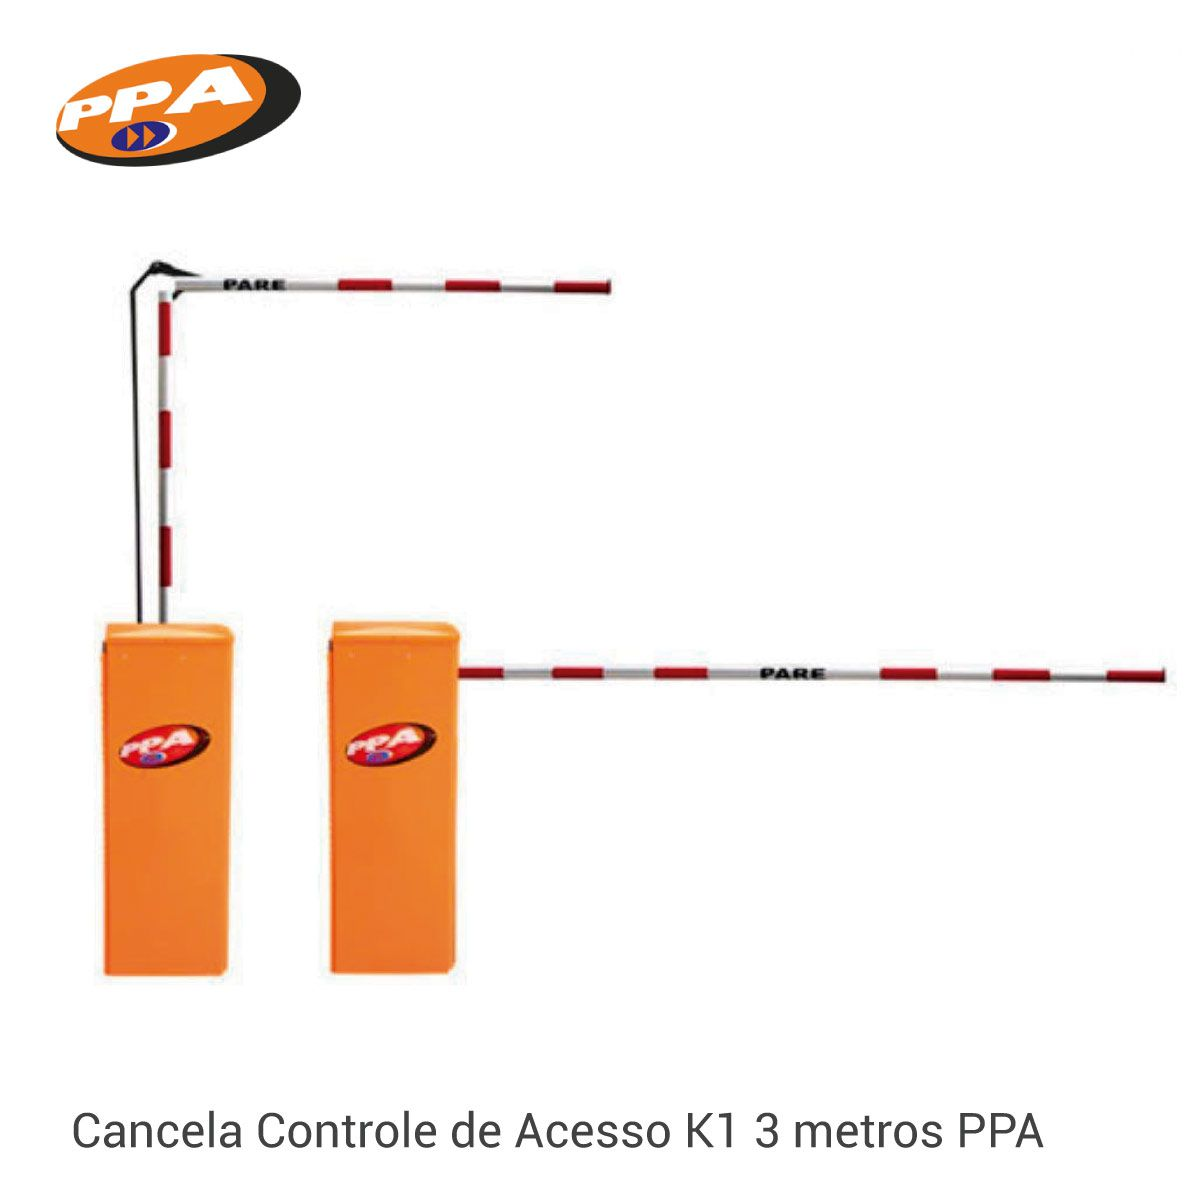 Cancela Controle de Acesso K1 3 metros PPA